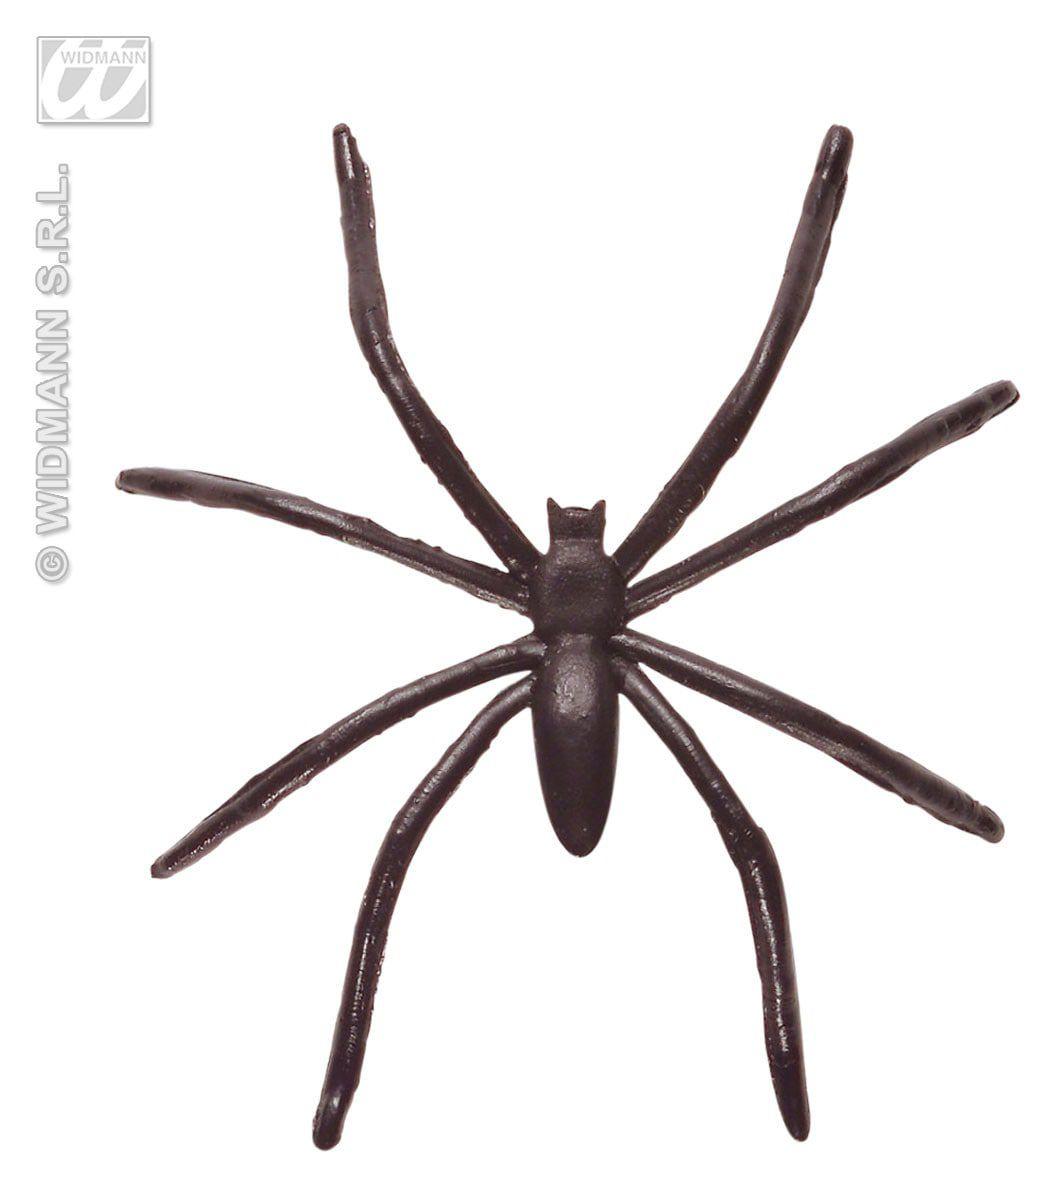 50 Spinnen, Pvc